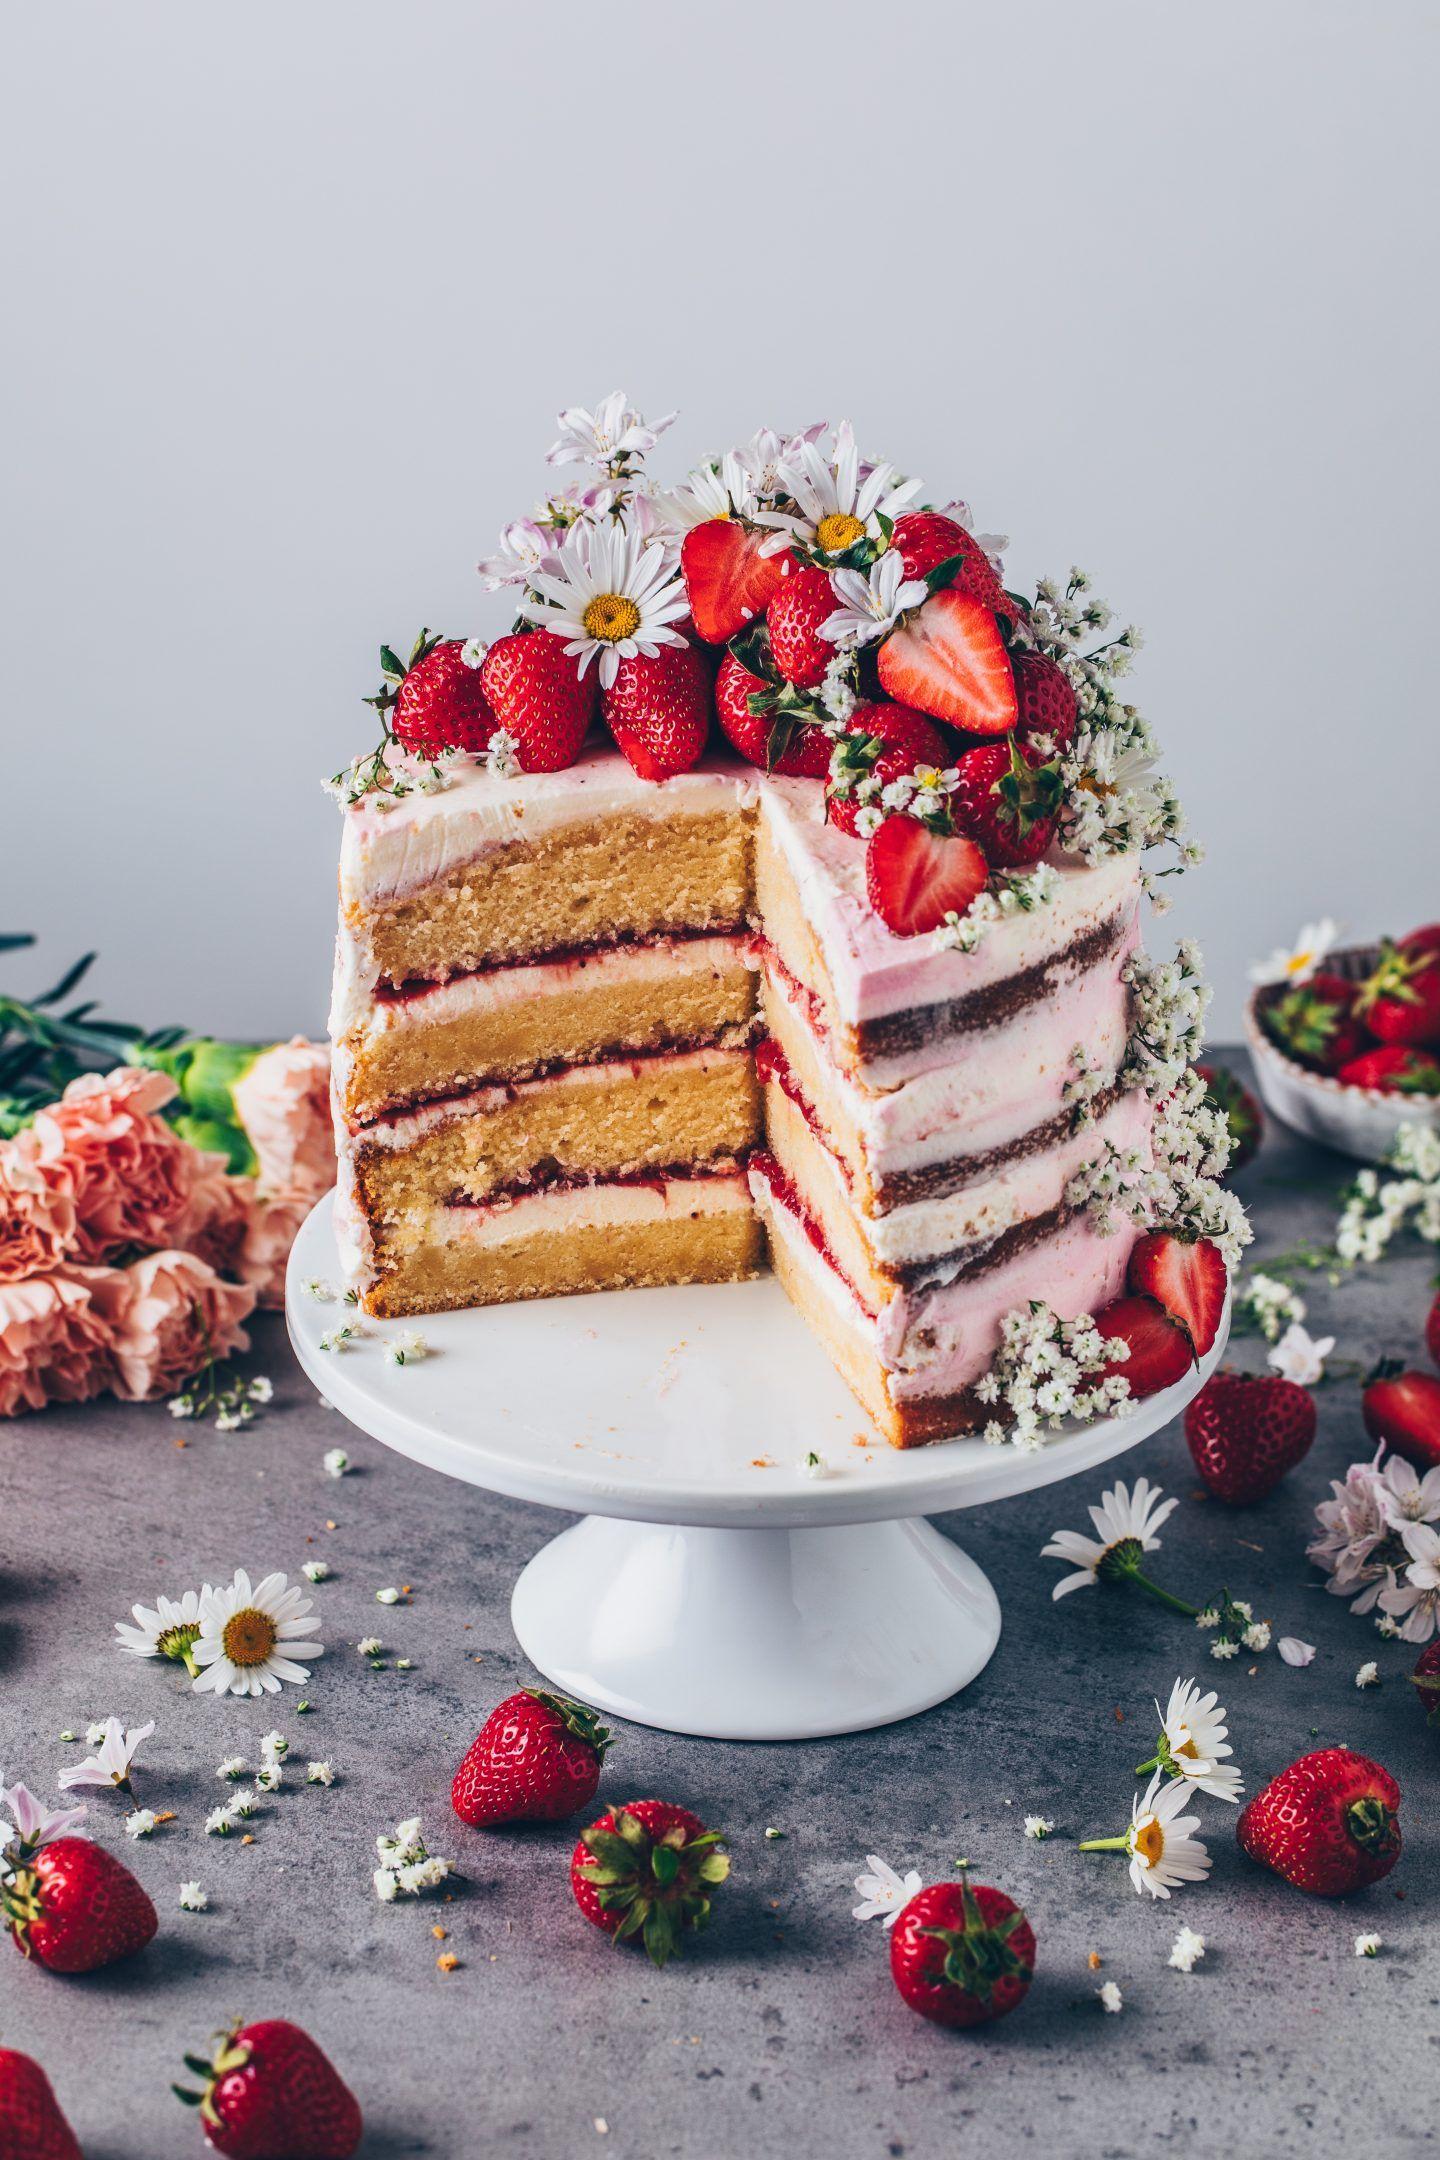 Erdbeer-Sahne-Torte mit Baileys - Bianca Zapatka | Rezepte